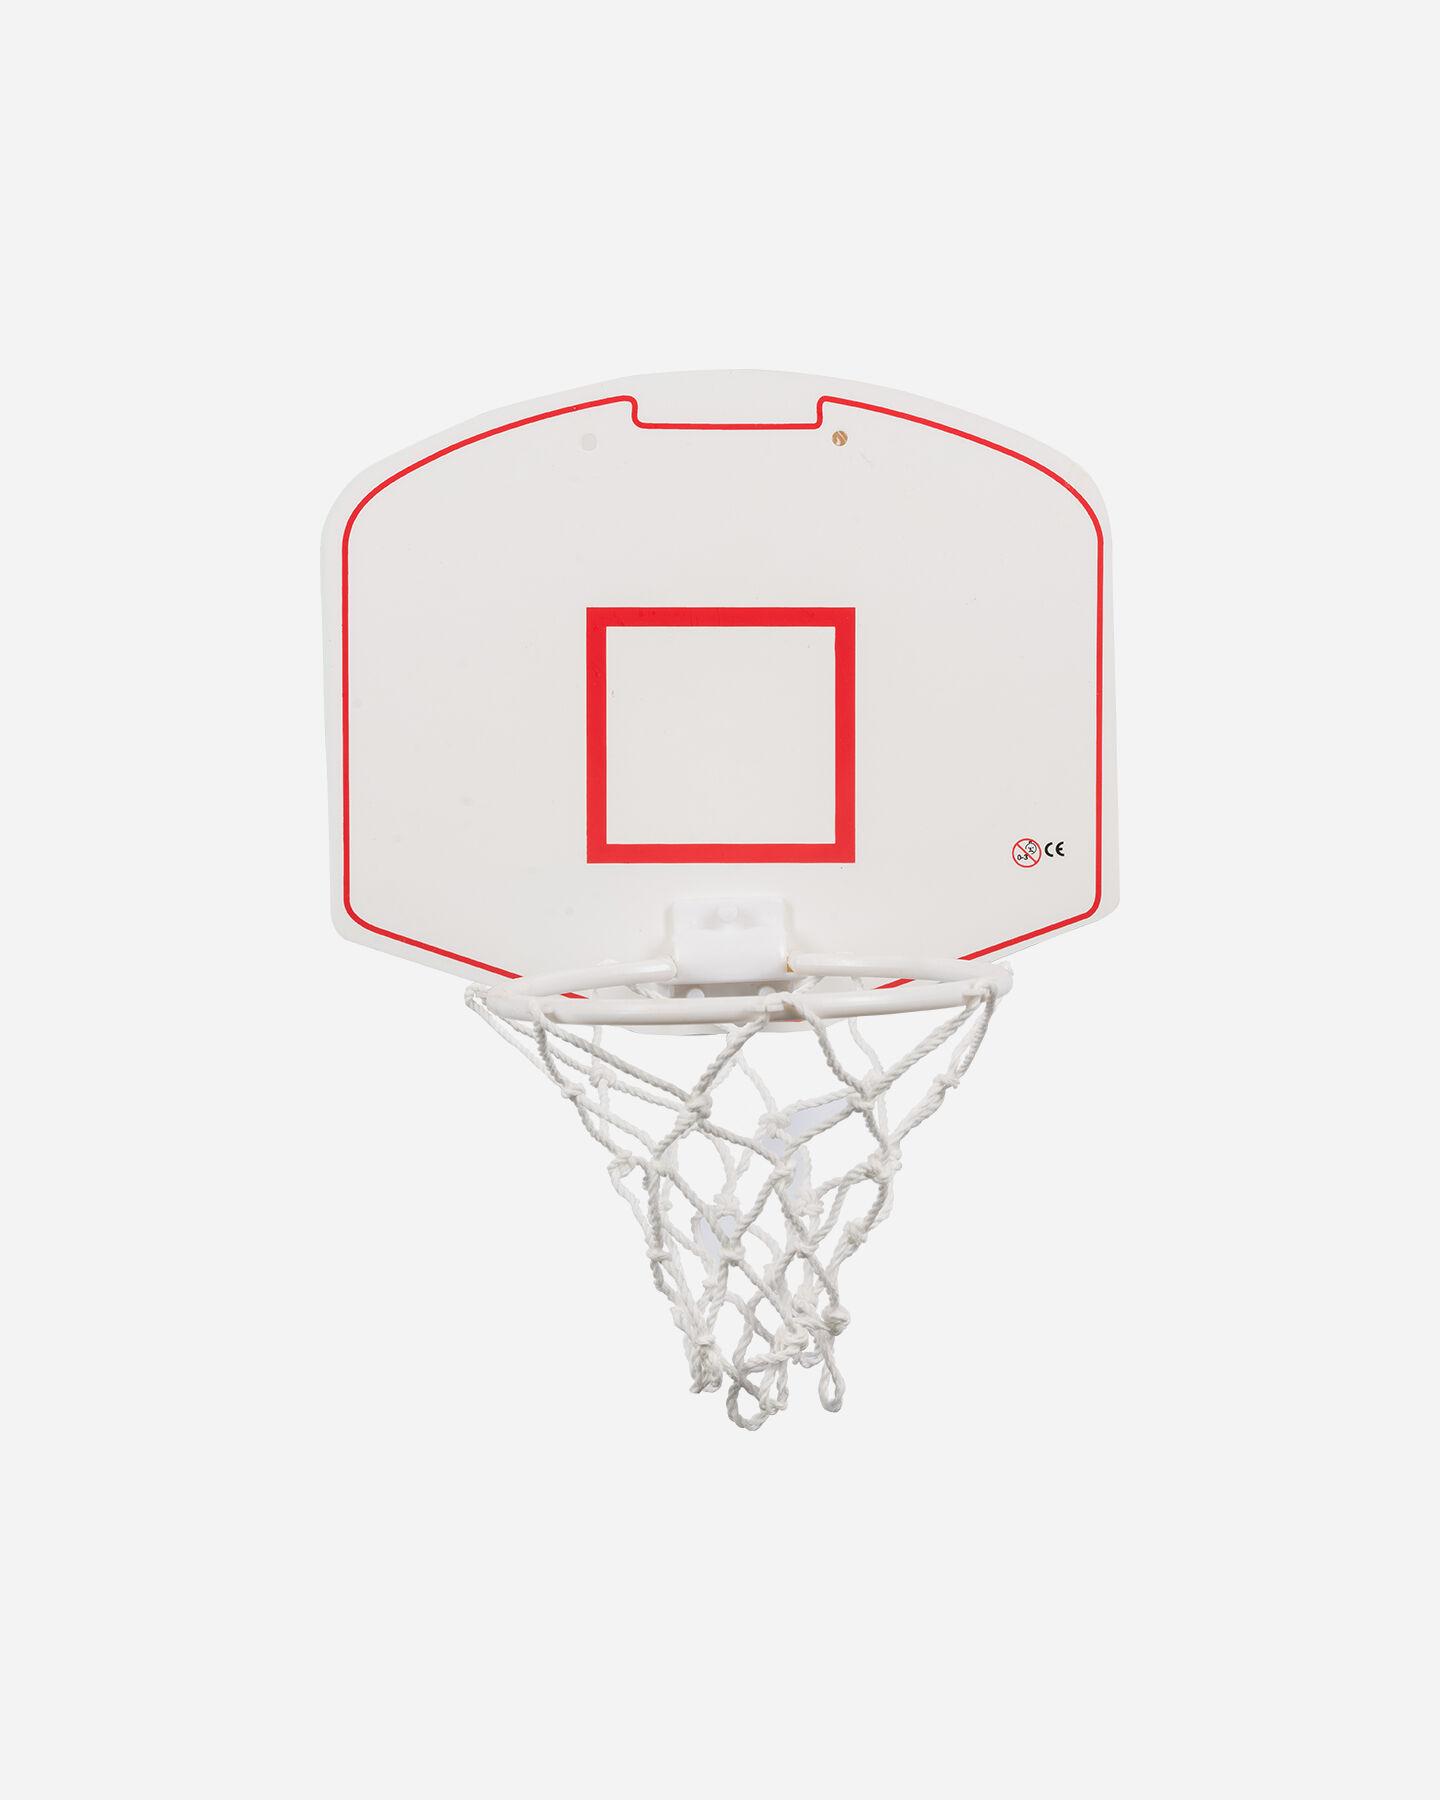 Canestro tabellone basket PRO TOUCH SET MINI BASKETBALL JR S2000104 900 - scatto 0